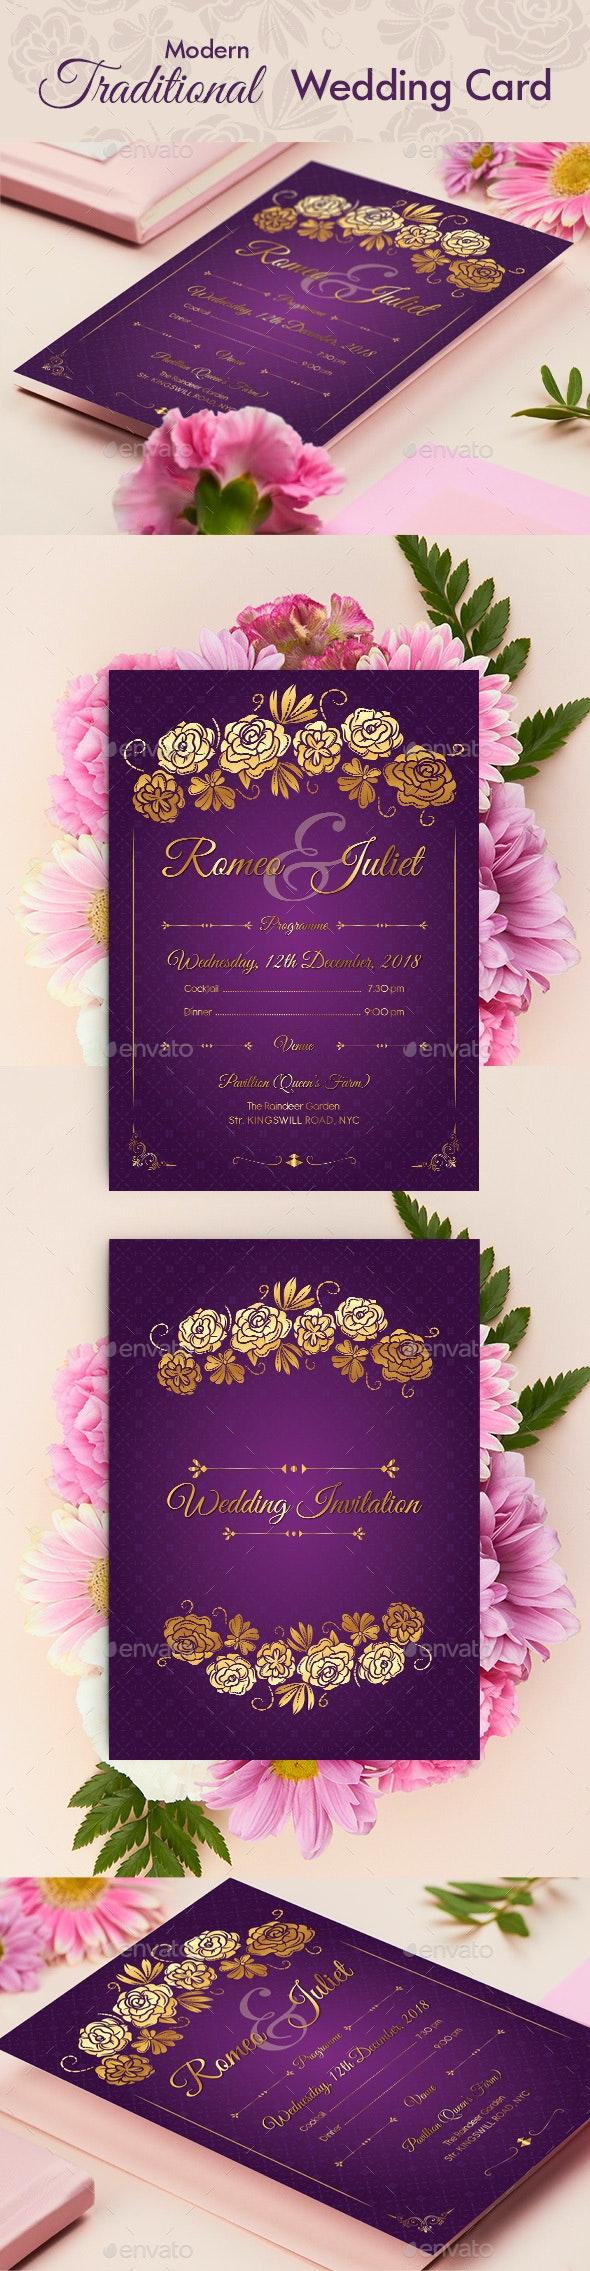 Modern Traditional Style Wedding Invitation - Wedding Greeting Cards